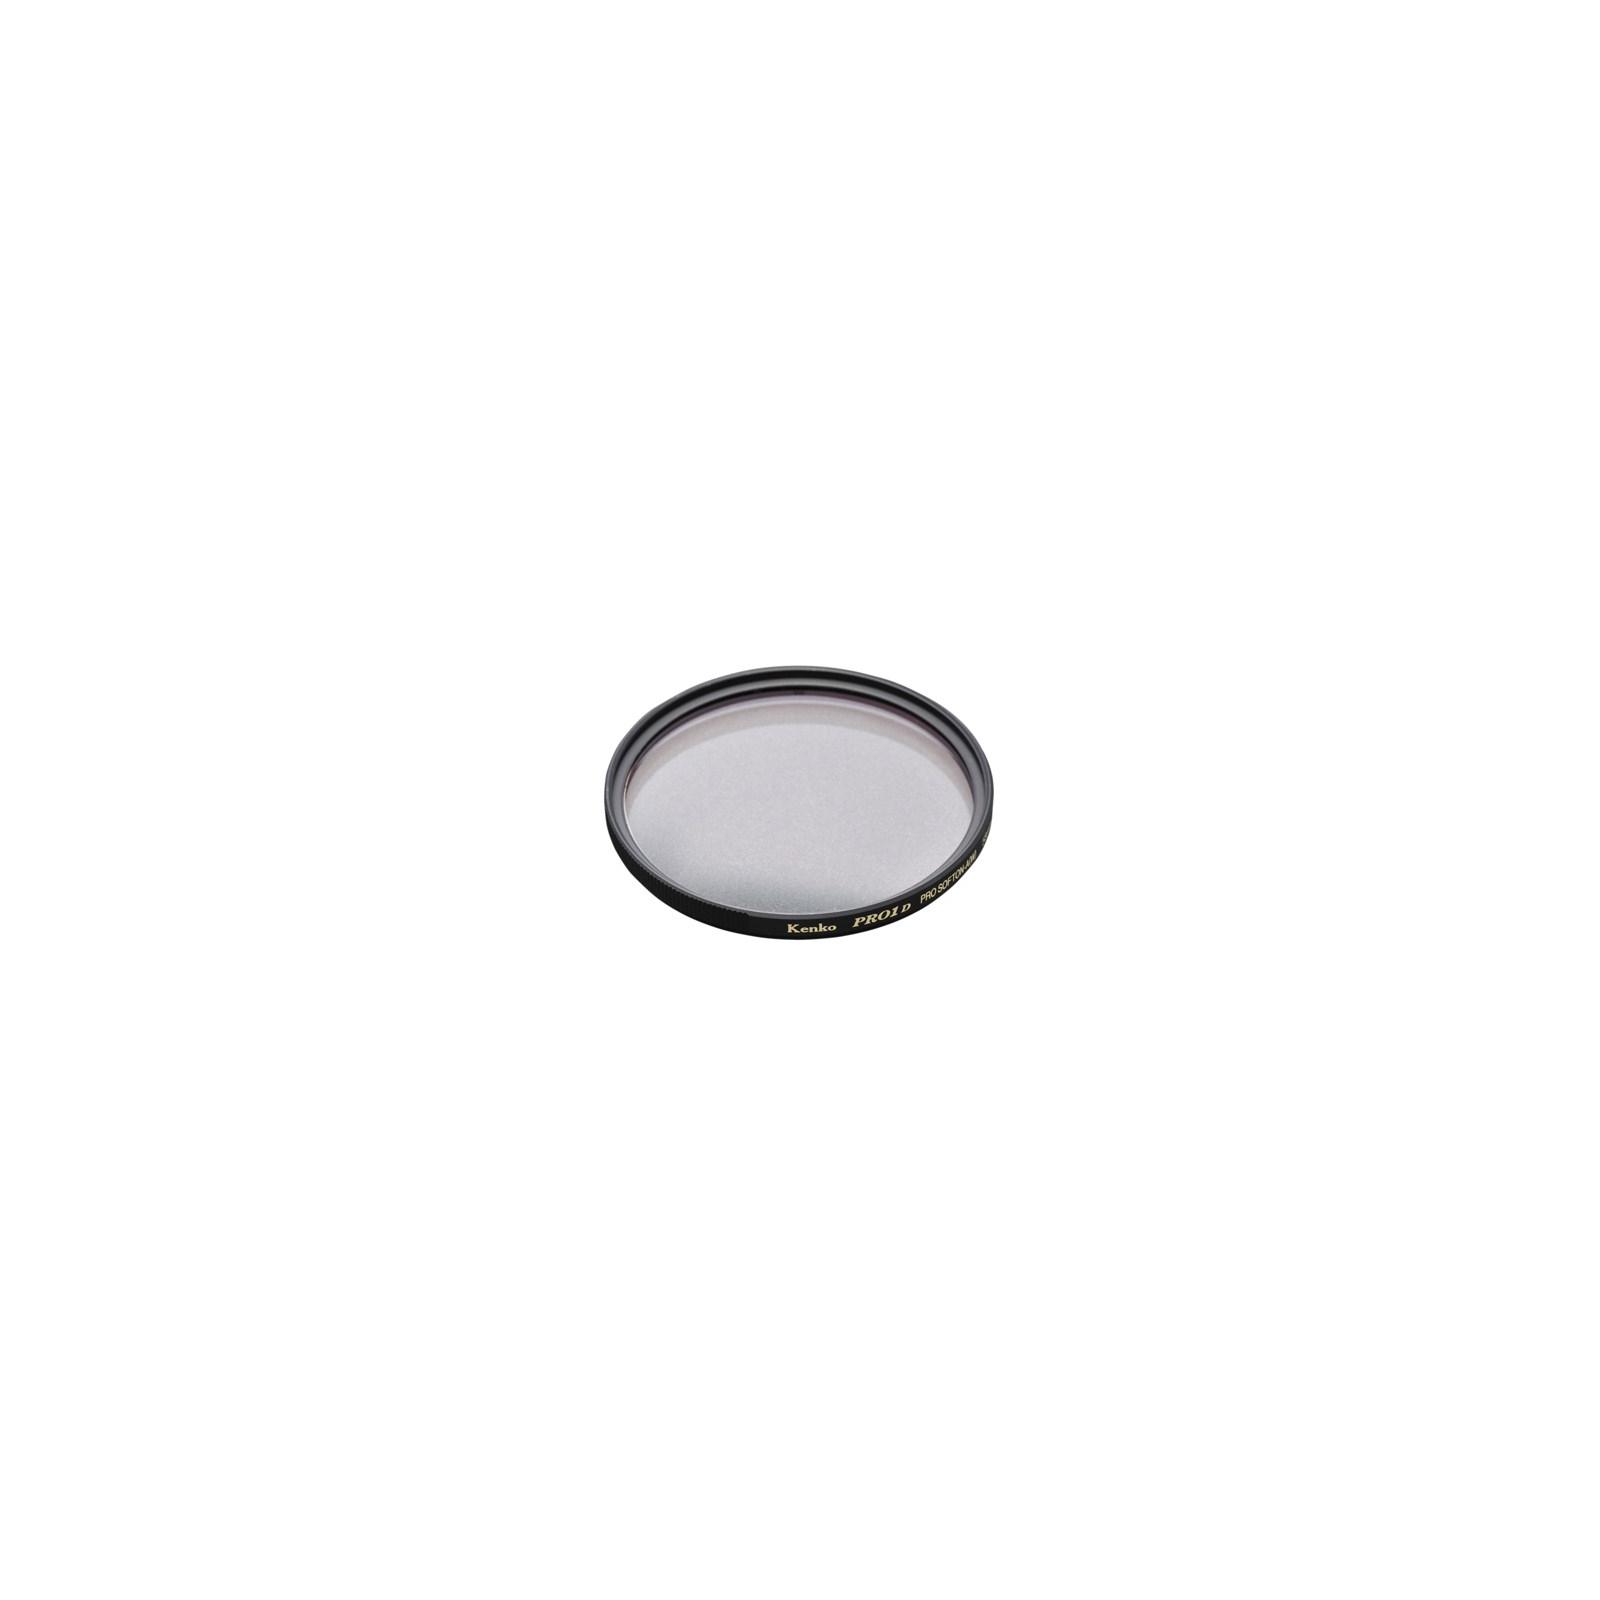 Светофильтр Kenko PRO1D PRO SOFTON 52mm (235271)